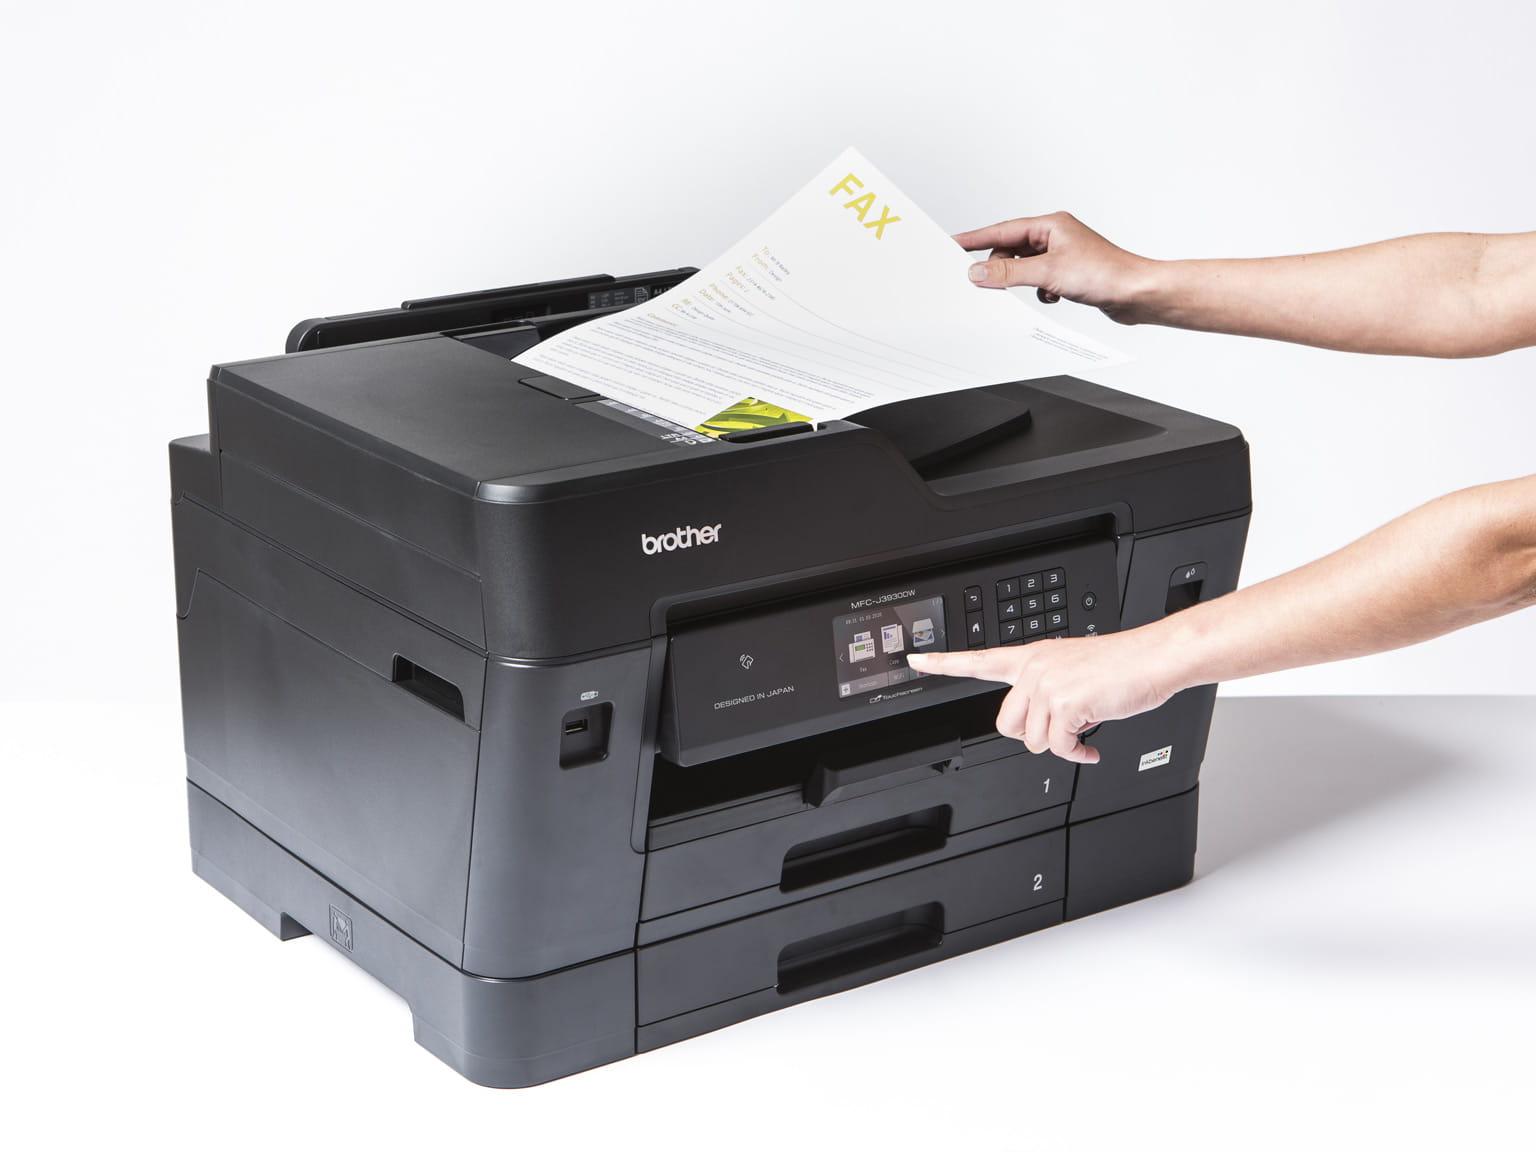 Brother-MFC-J3930DW-printer